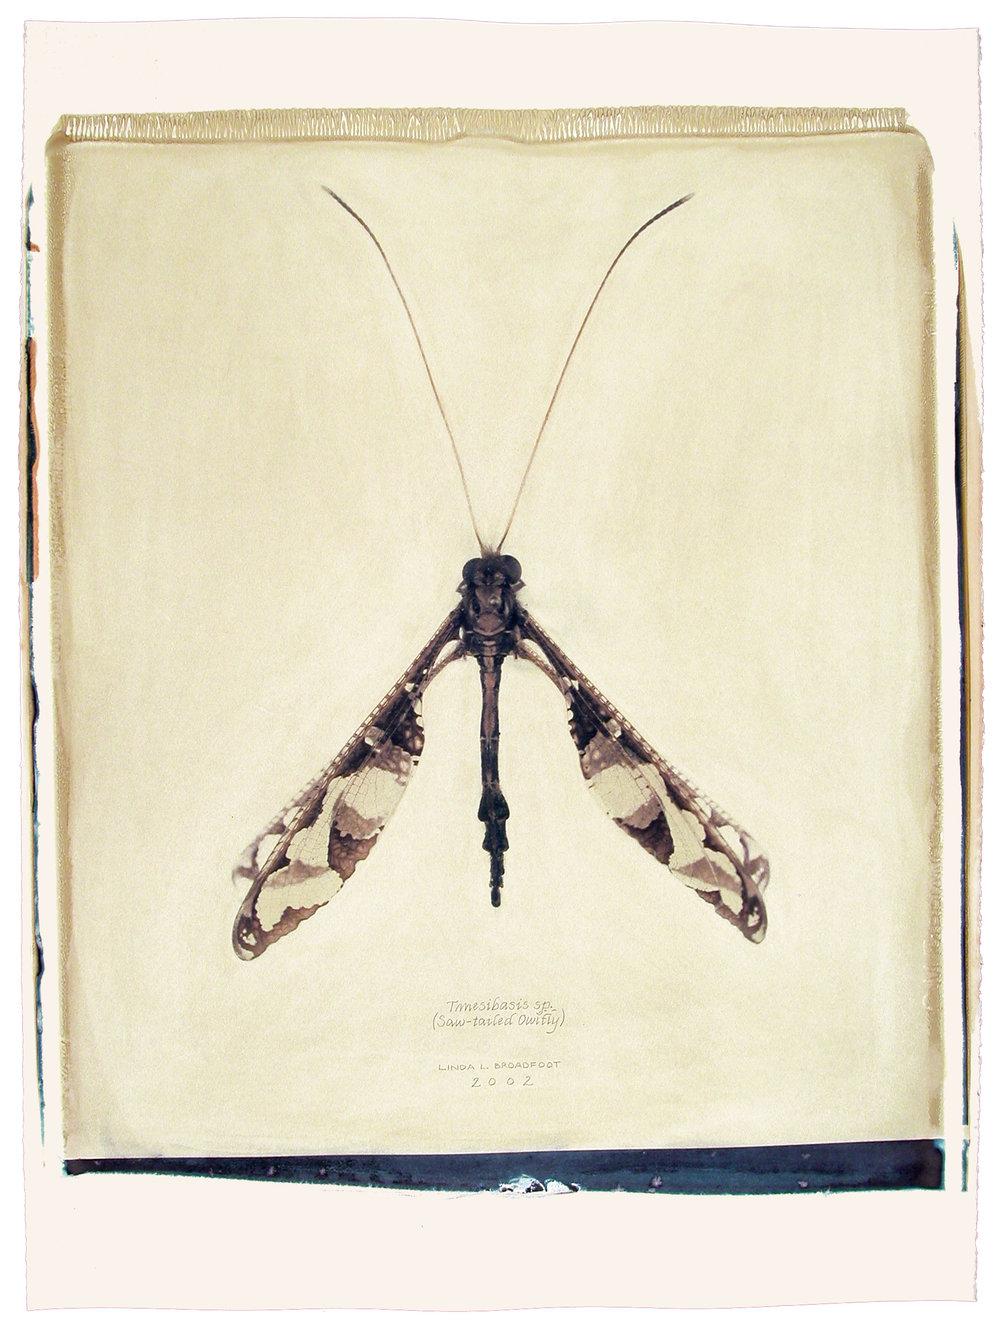 Tmesibasis sp.  (Saw-tailed Owlfly), 2002